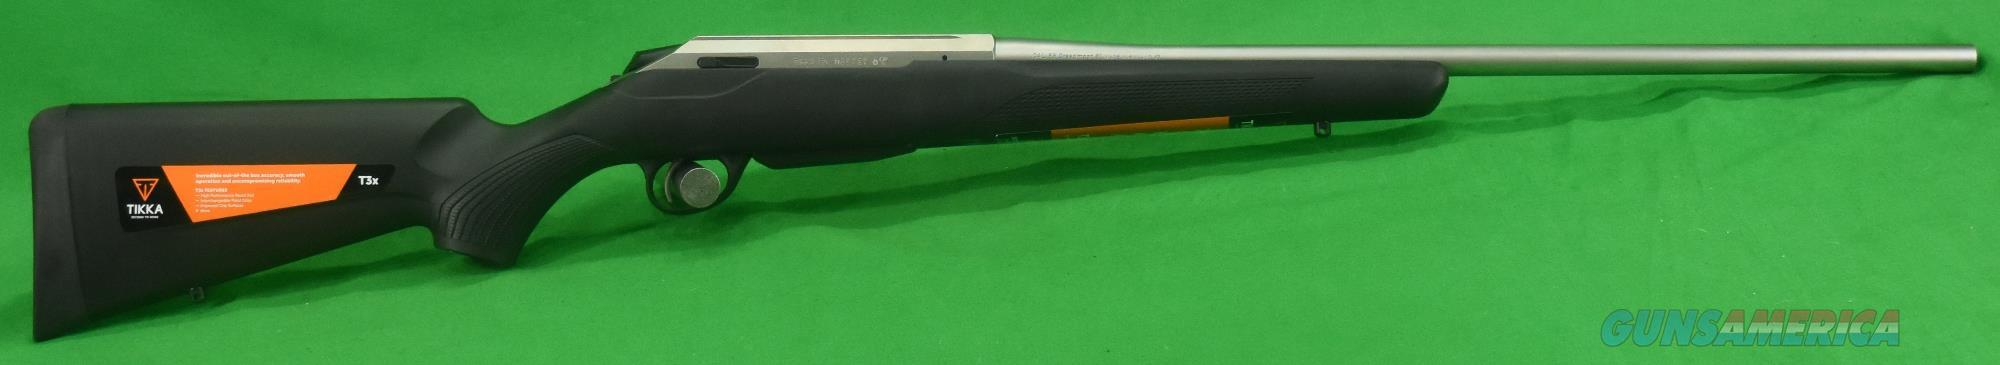 T3x Lite Stainless LH 6.5CM 24.3In JRTXB482  Guns > Rifles > Tikka Rifles > T3